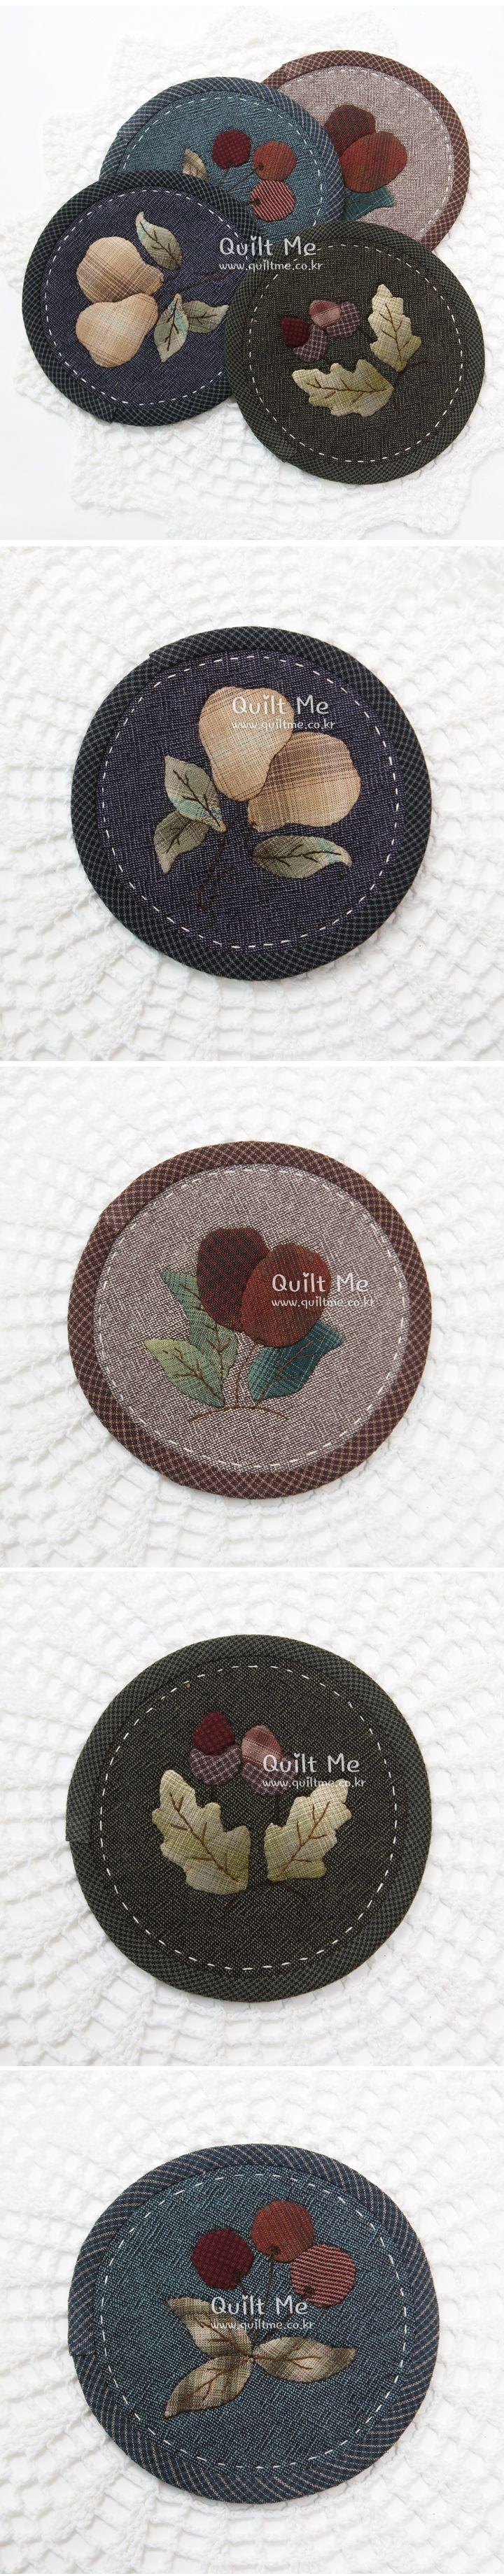 http://quiltme.co.kr/shop/shopdetail.html?branduid=145754